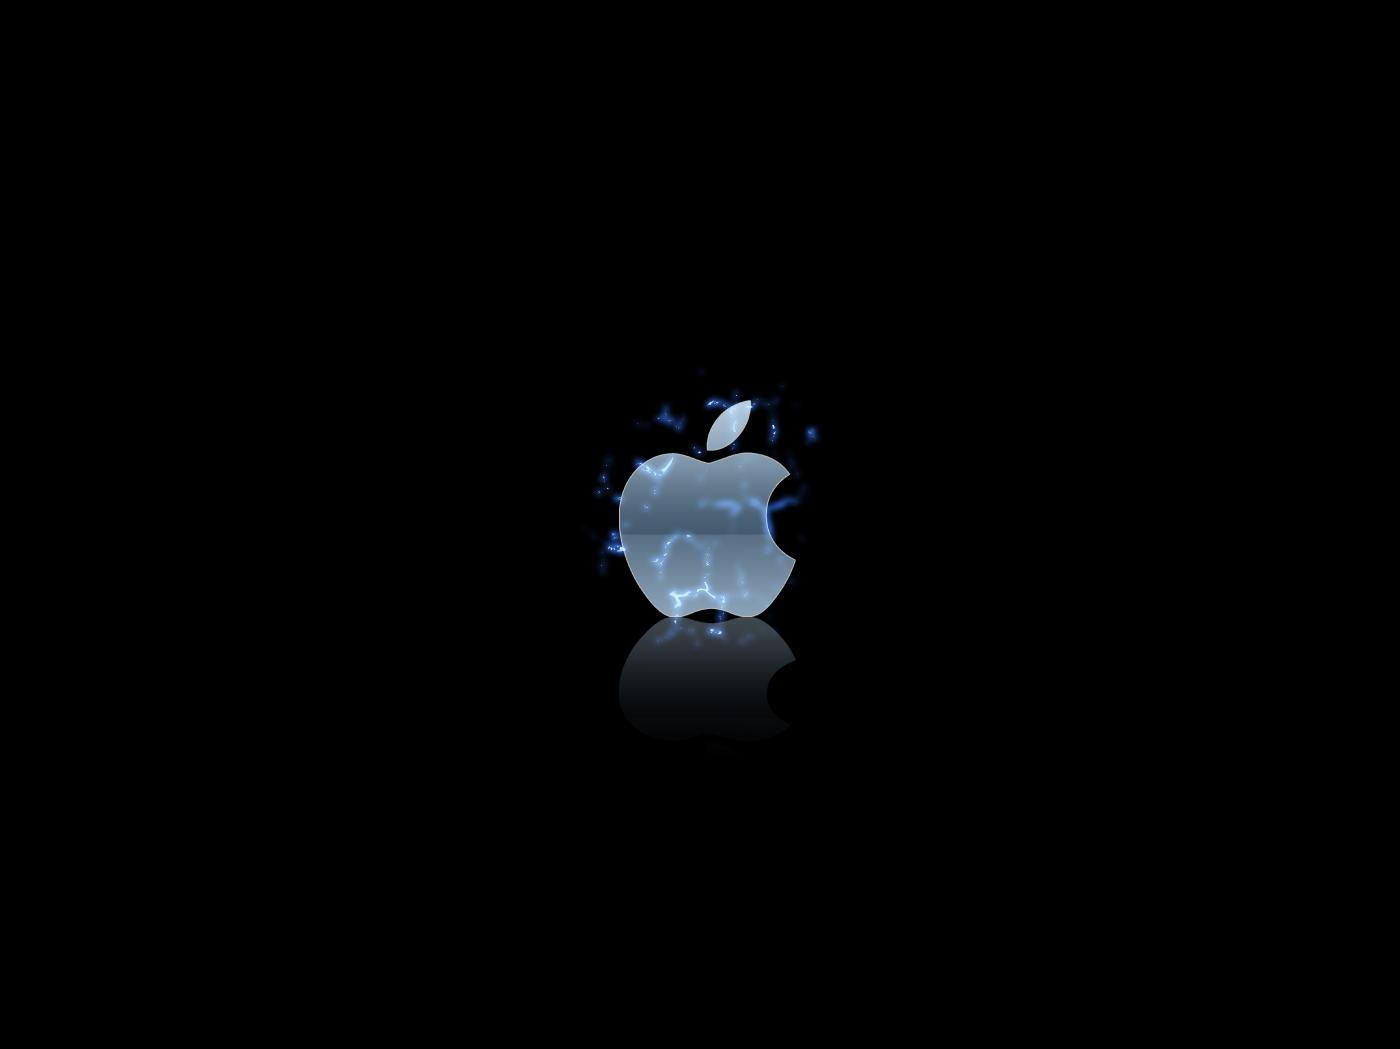 chidori apple by kevinvanderven